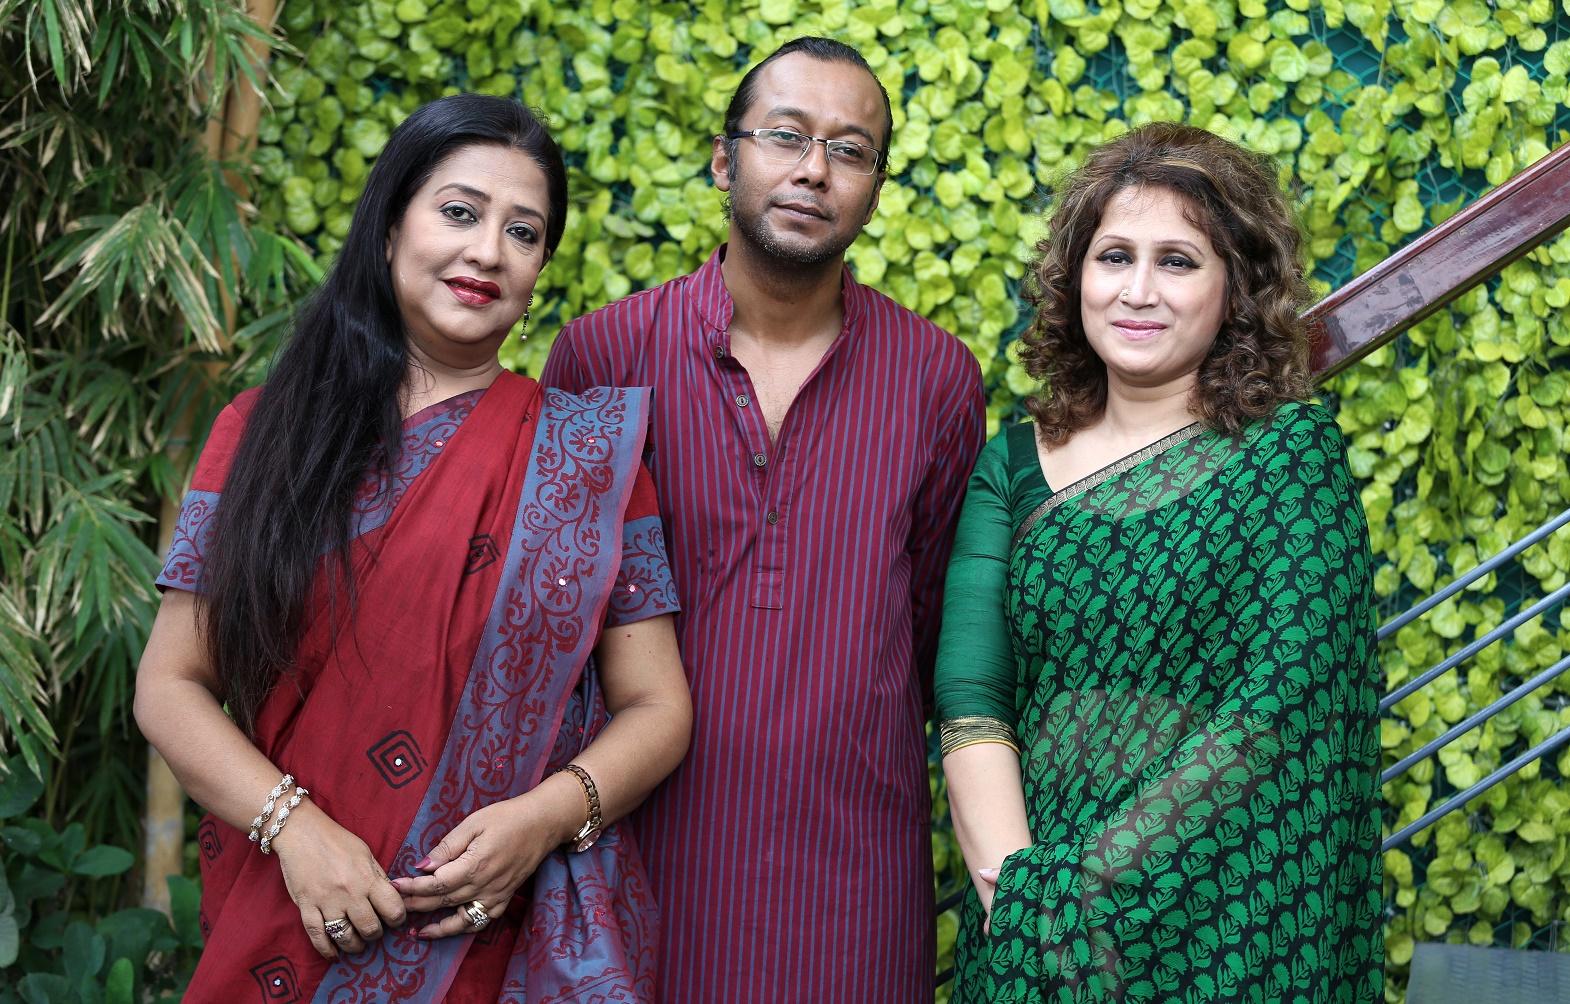 Suborna, Soud under Samia Rahman's direction, planning